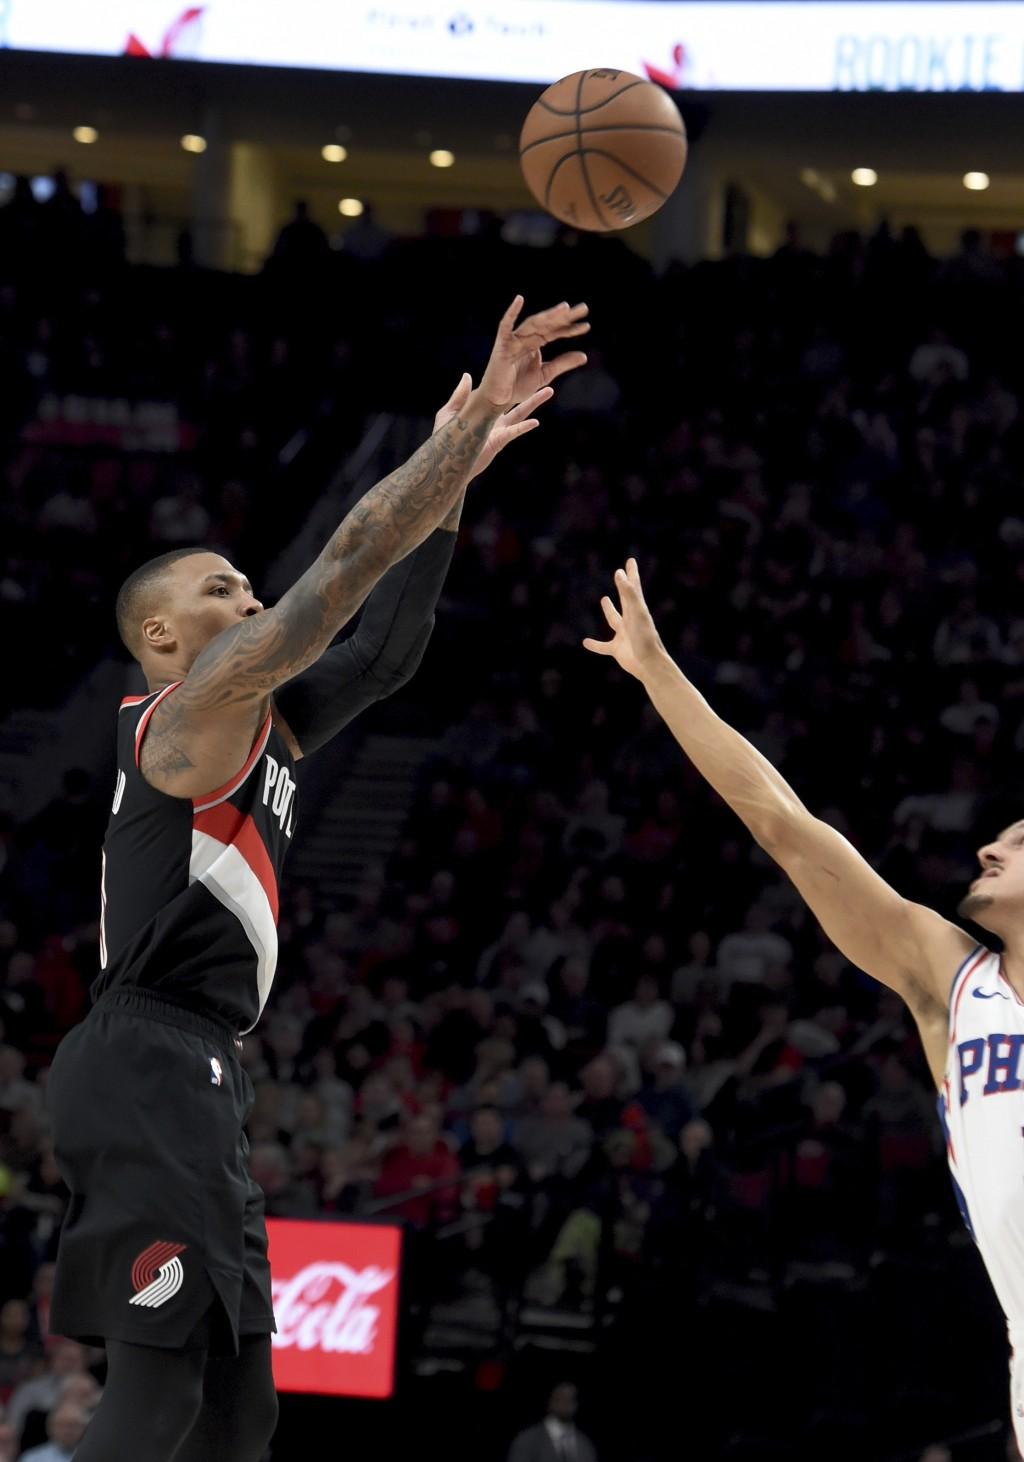 Portland Trail Blazers guard Damian Lillard hits a shot during the second half of an NBA basketball game against the Philadelphia 76ers in Portland, O...